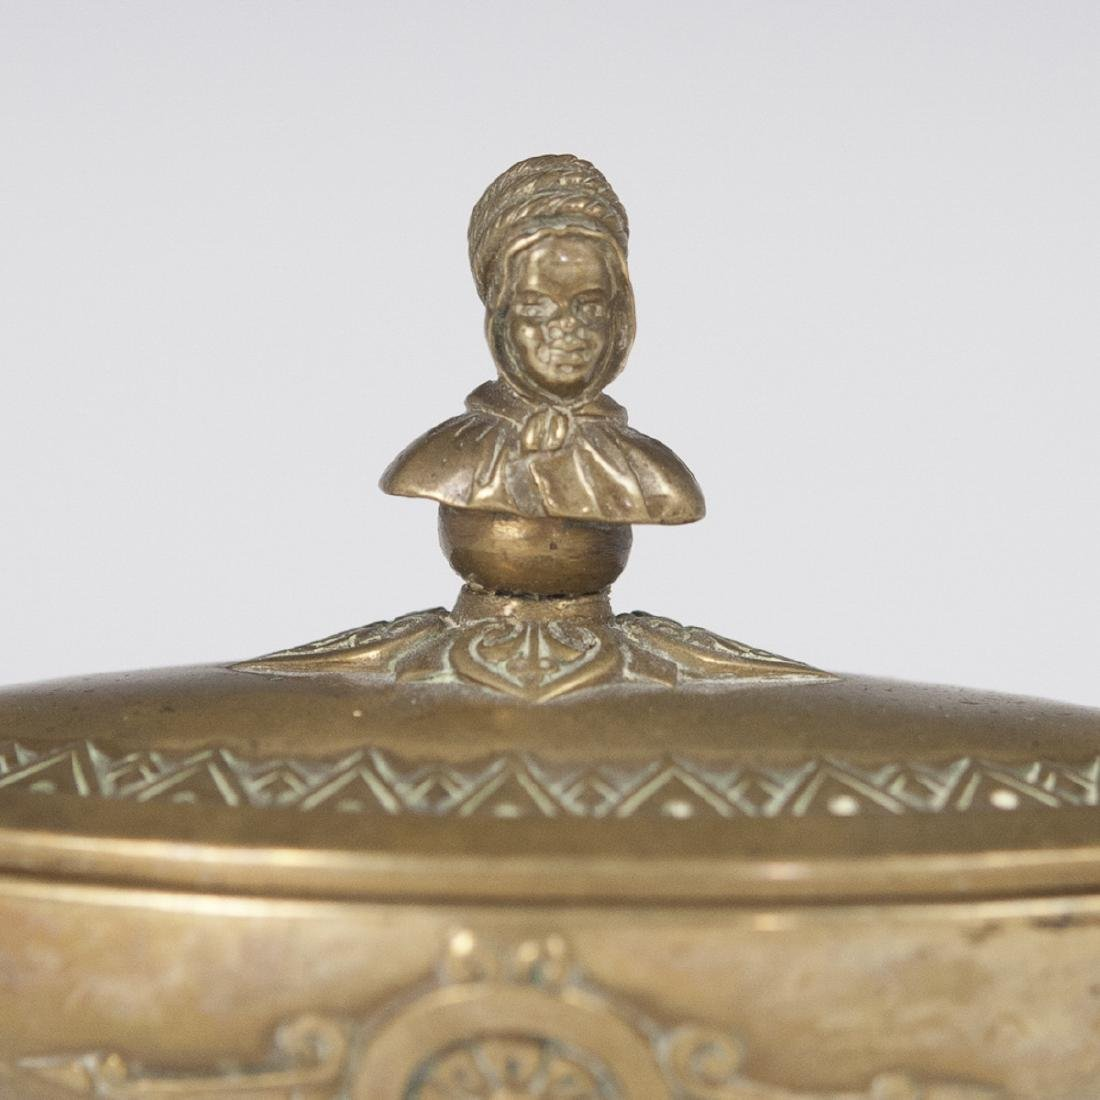 Antique Figural Dore Bronze Inkwell - 2